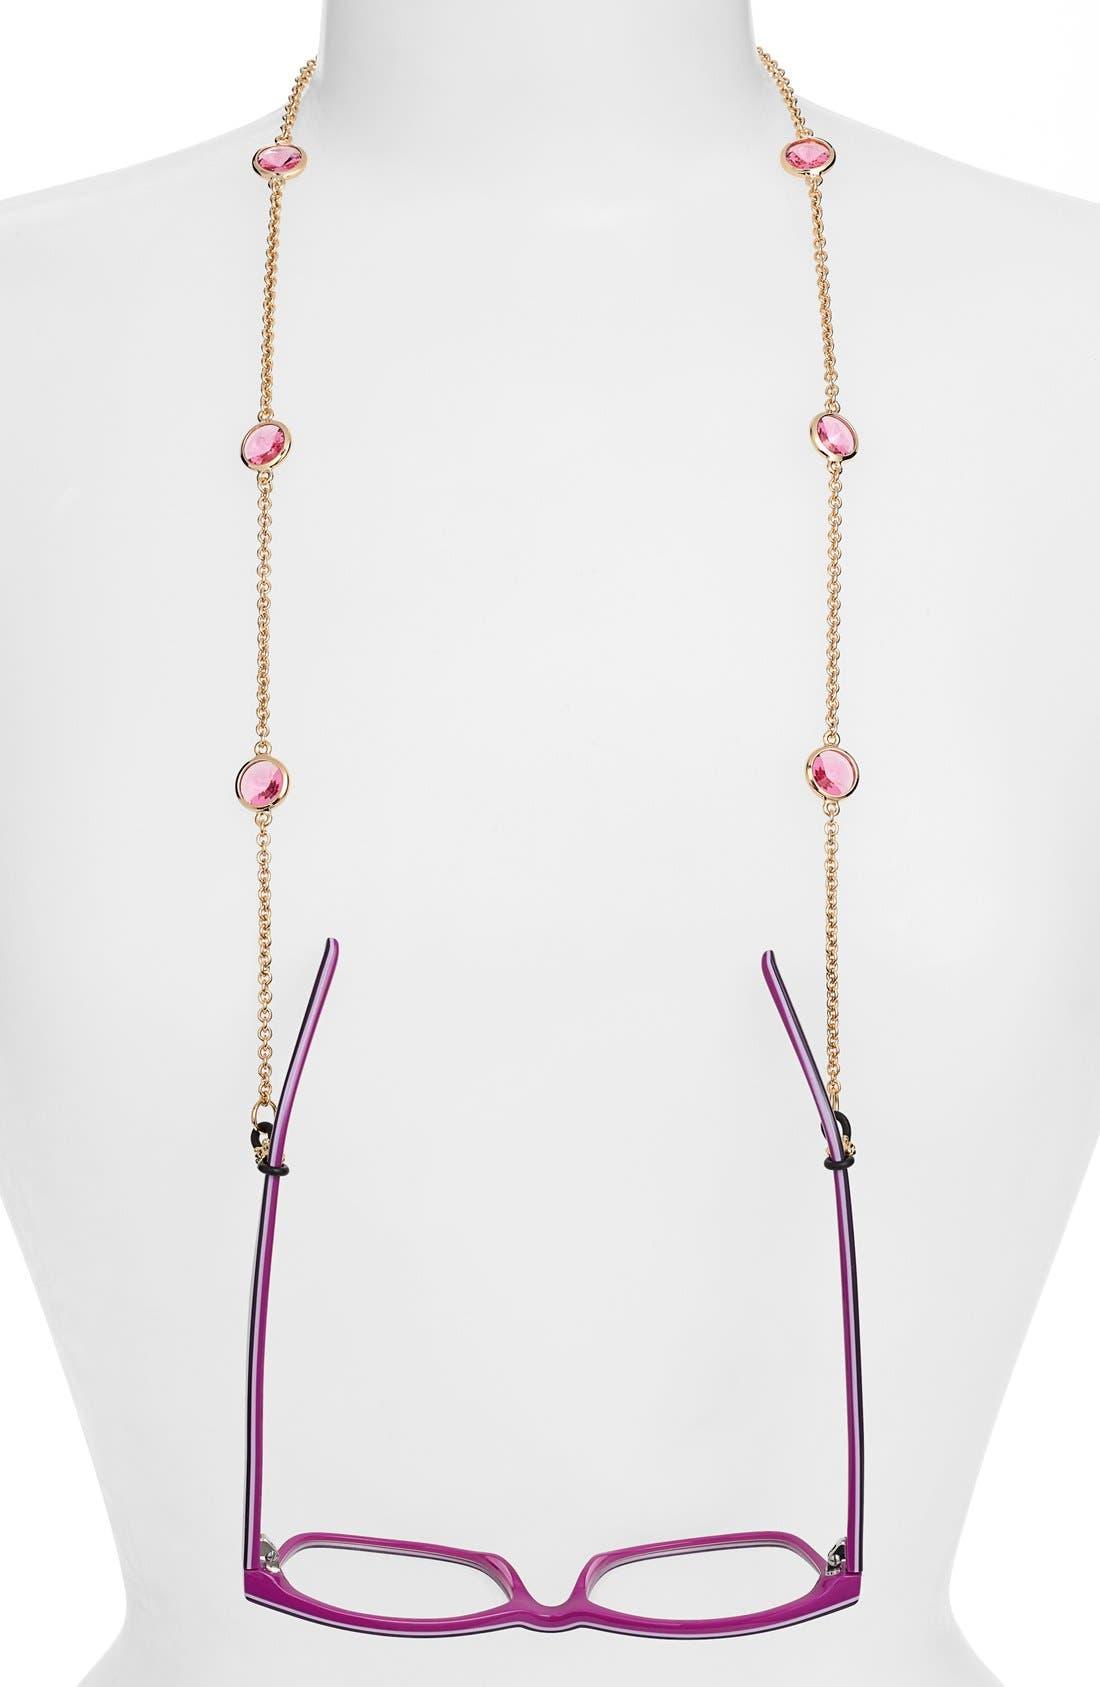 L. Erickson 'Charmer' Eyeglass Chain